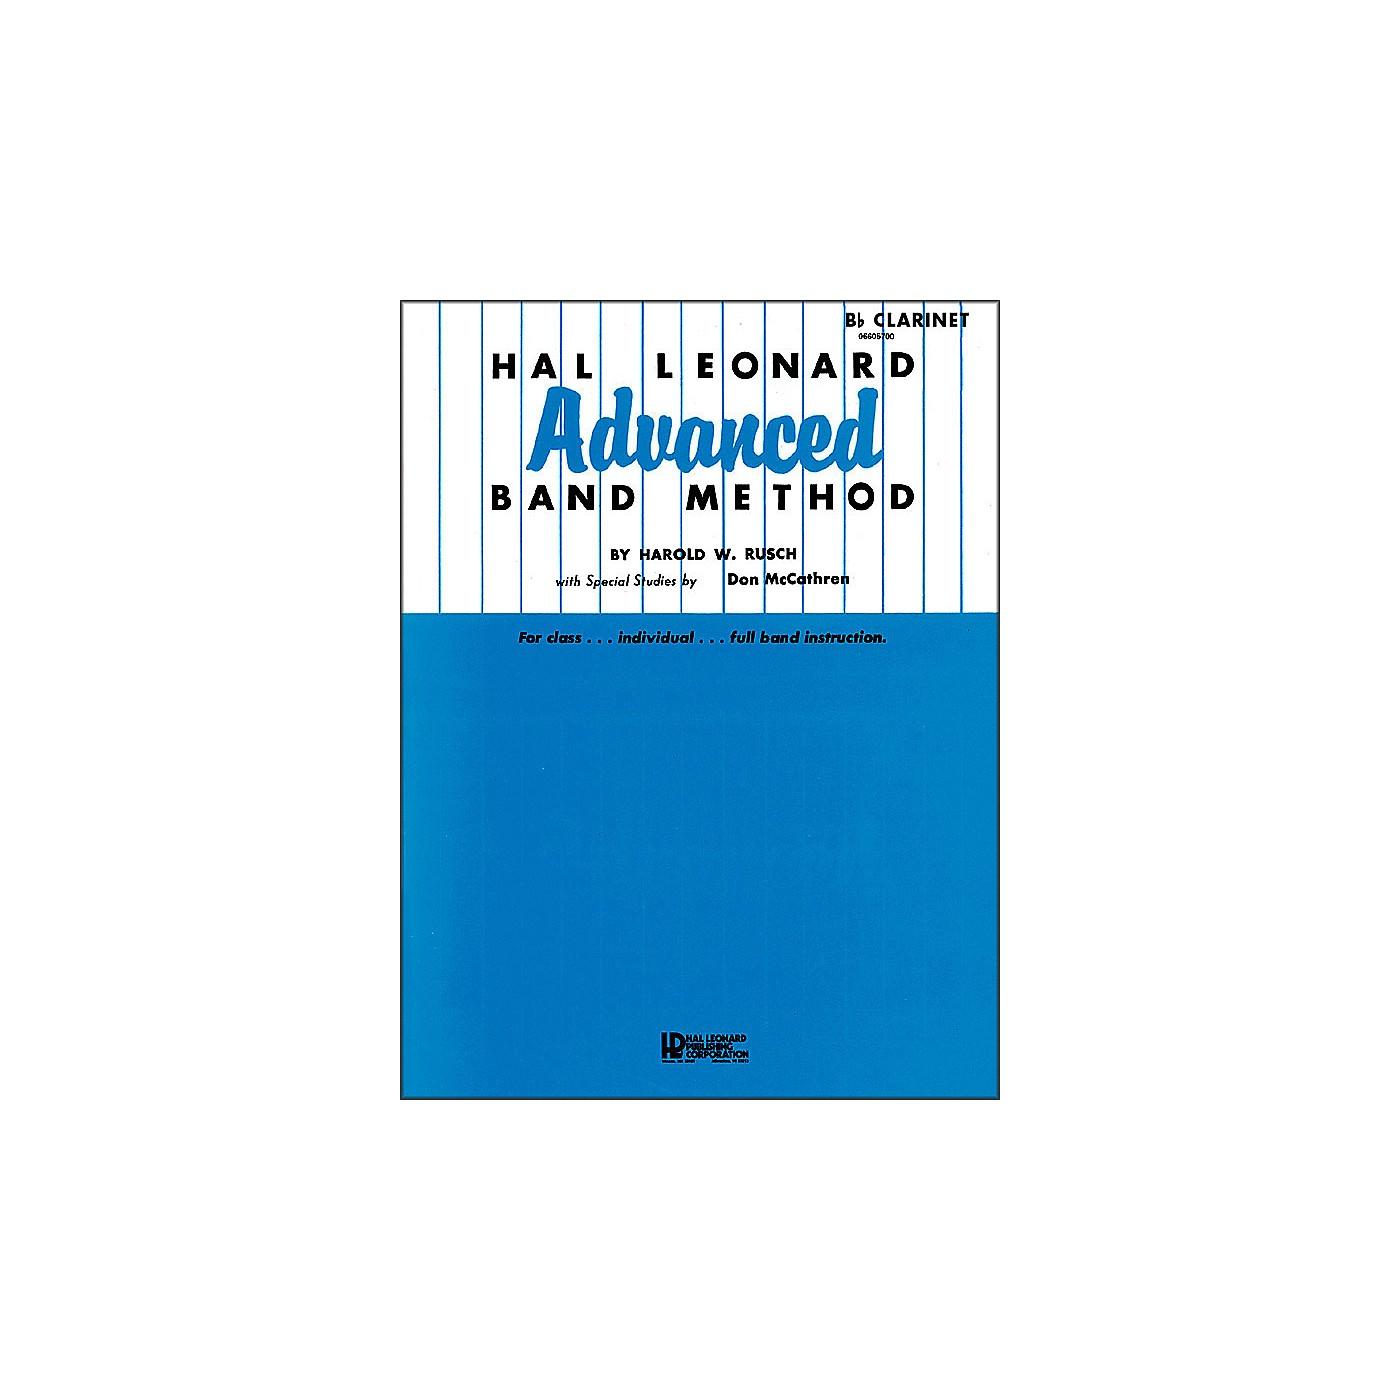 Hal Leonard Advanced Band Method - B-Flat Clarinet thumbnail